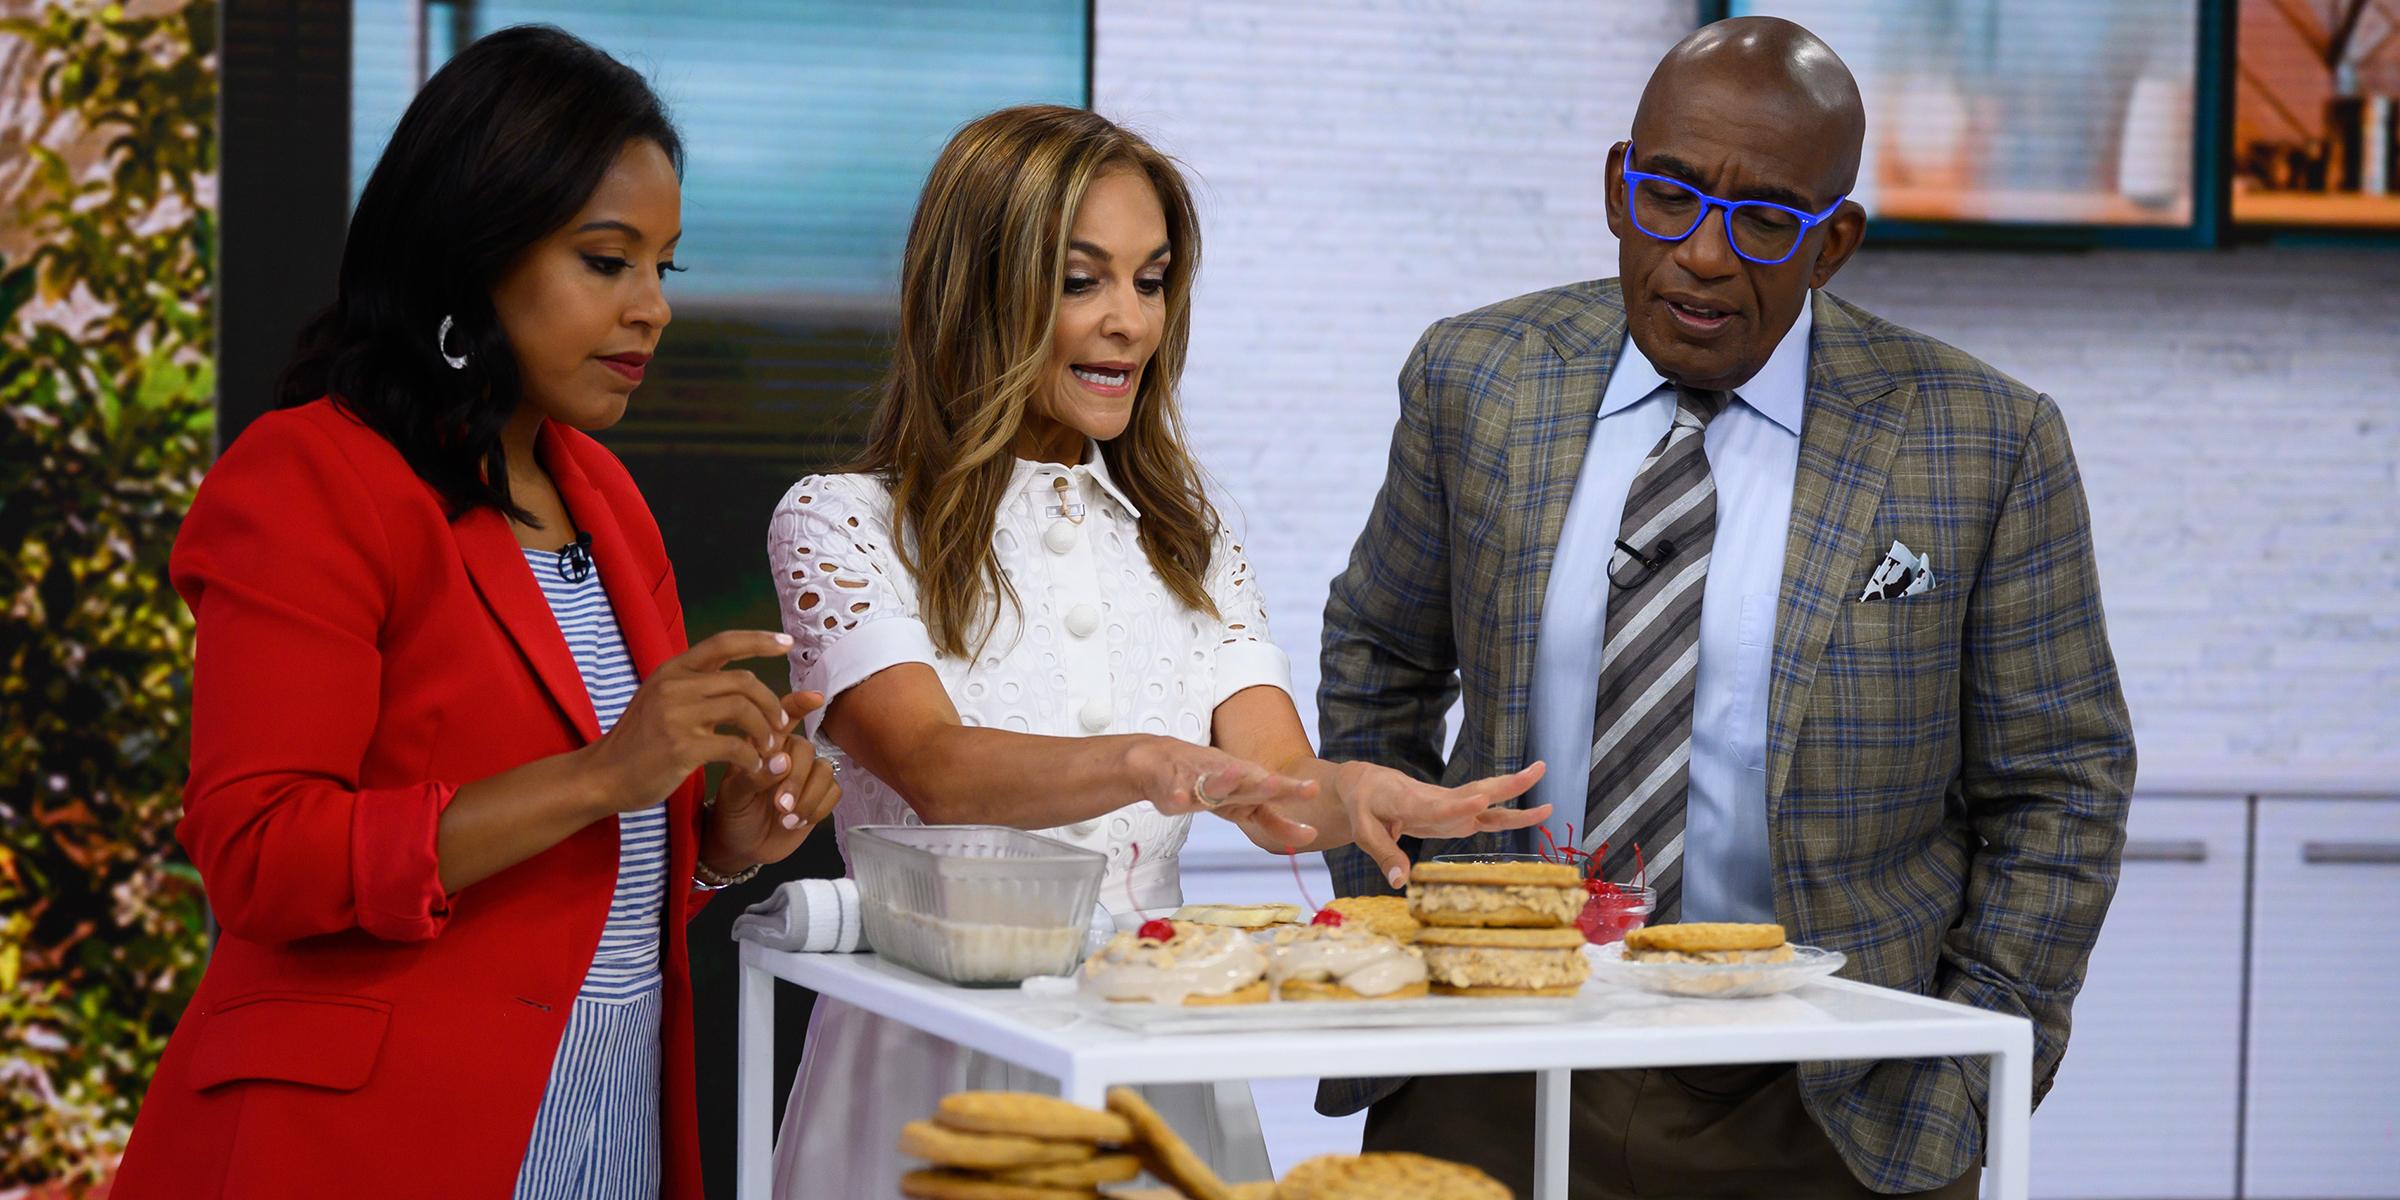 Healthy dessert recipes: Joy Bauer's sweet summer treats